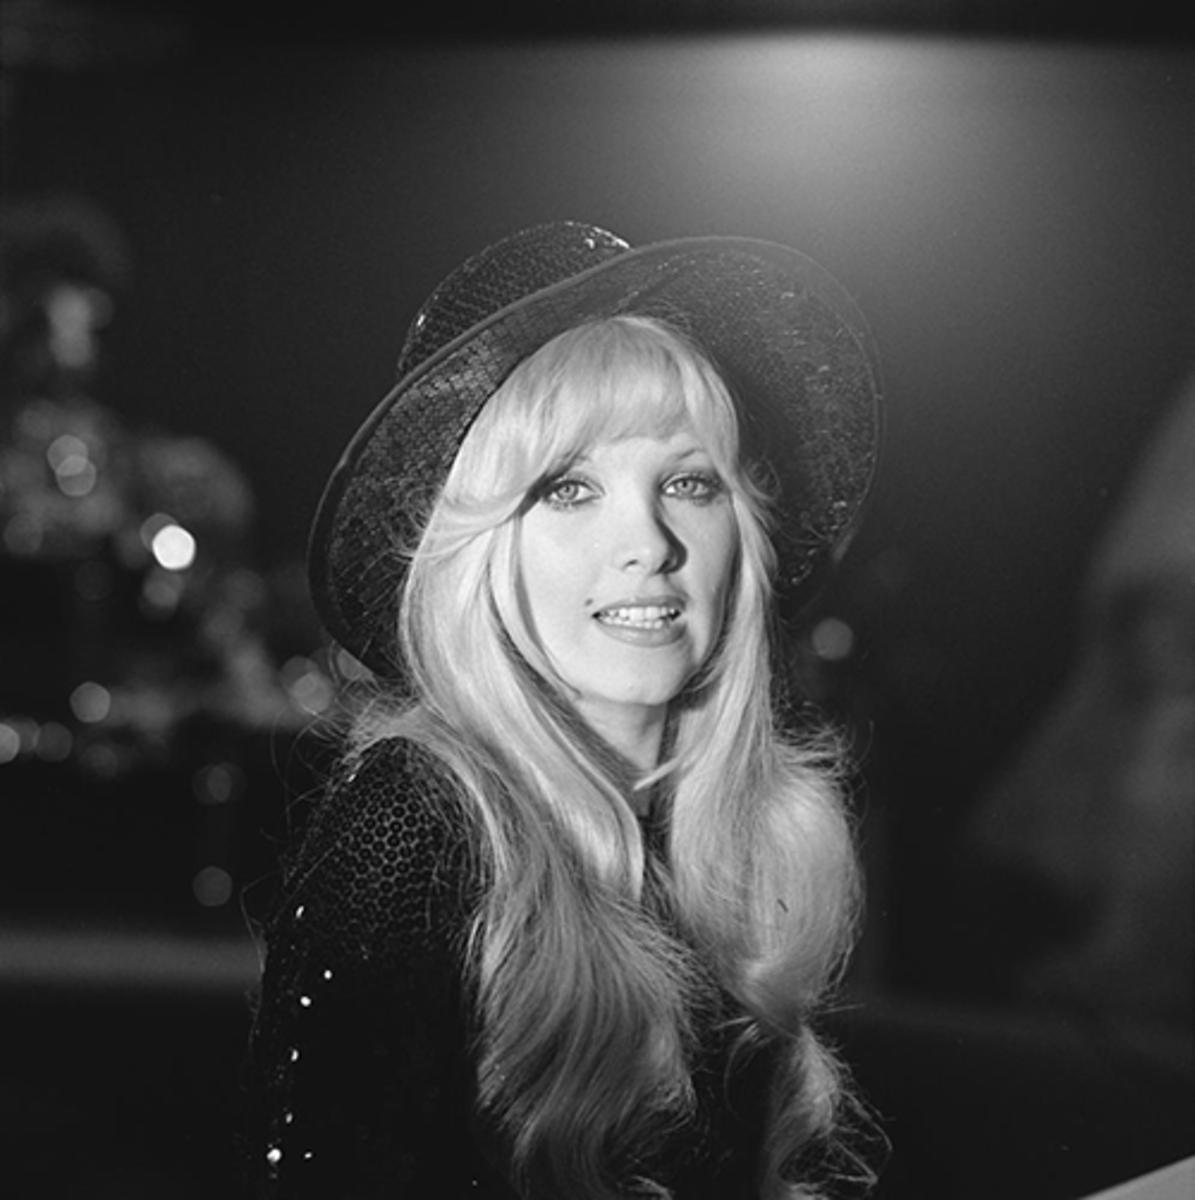 Lynsey de Paul photographed in 1974